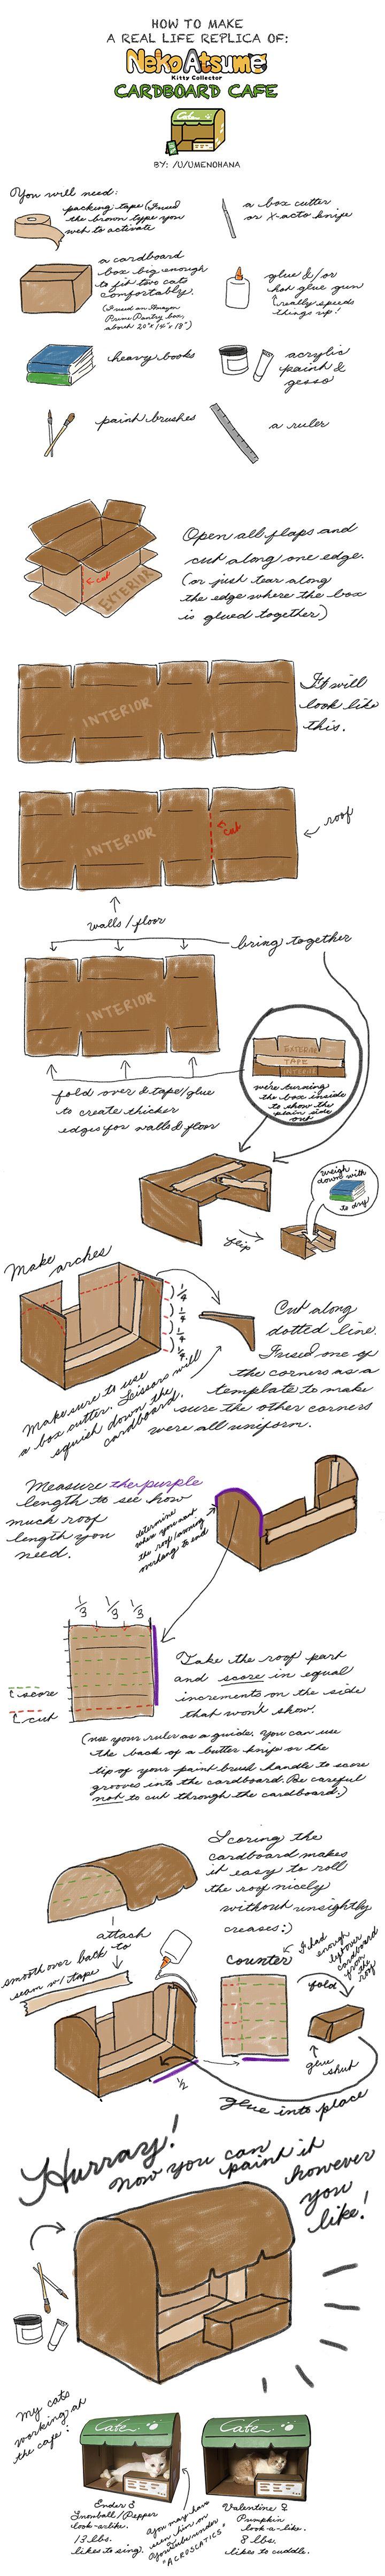 How to make a real life replica of the Neko Atsume Cardboard Cafe